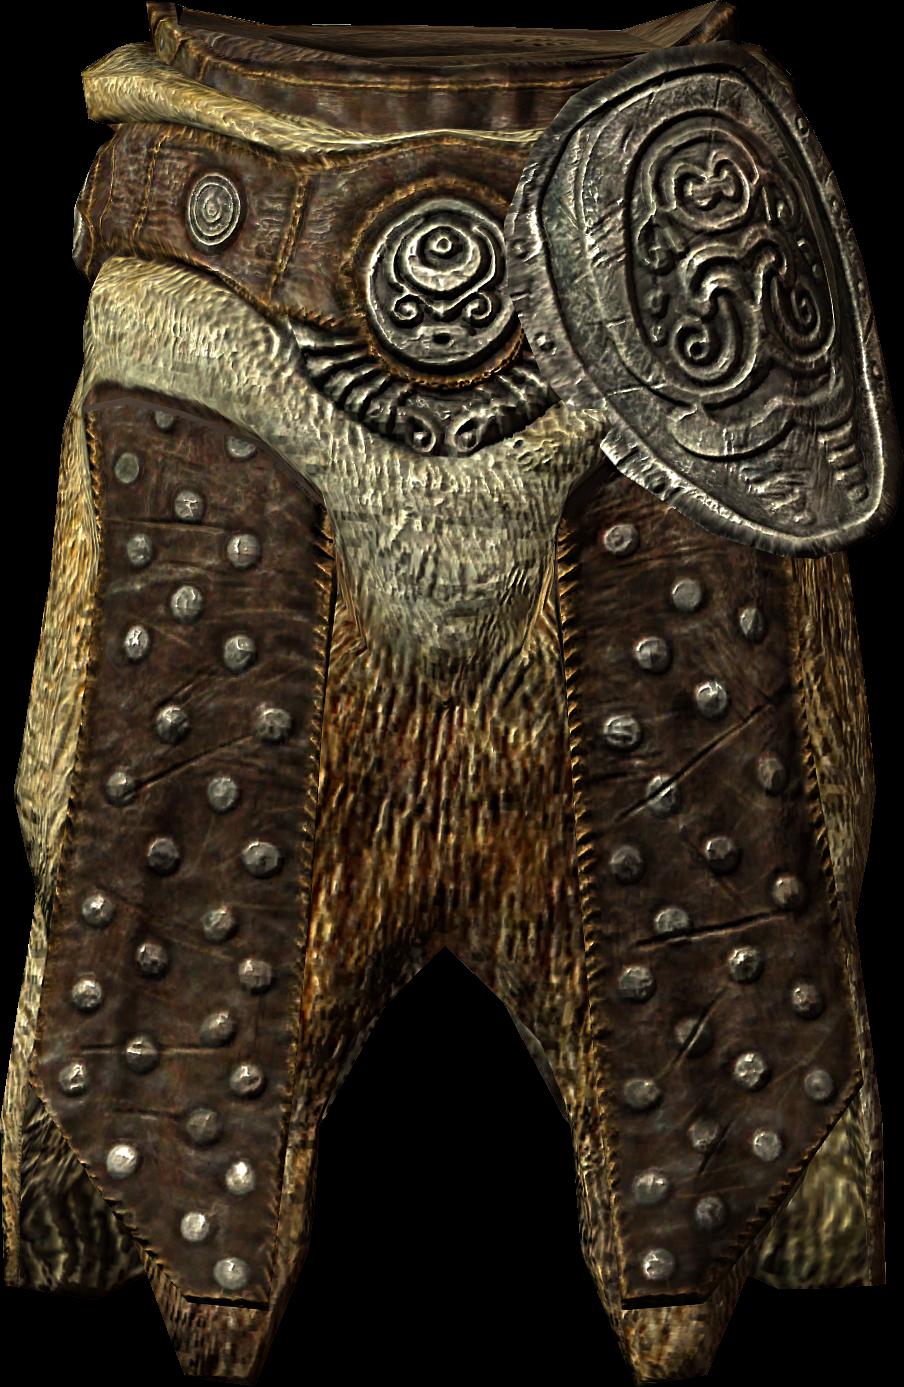 Studded Leather Armor ...